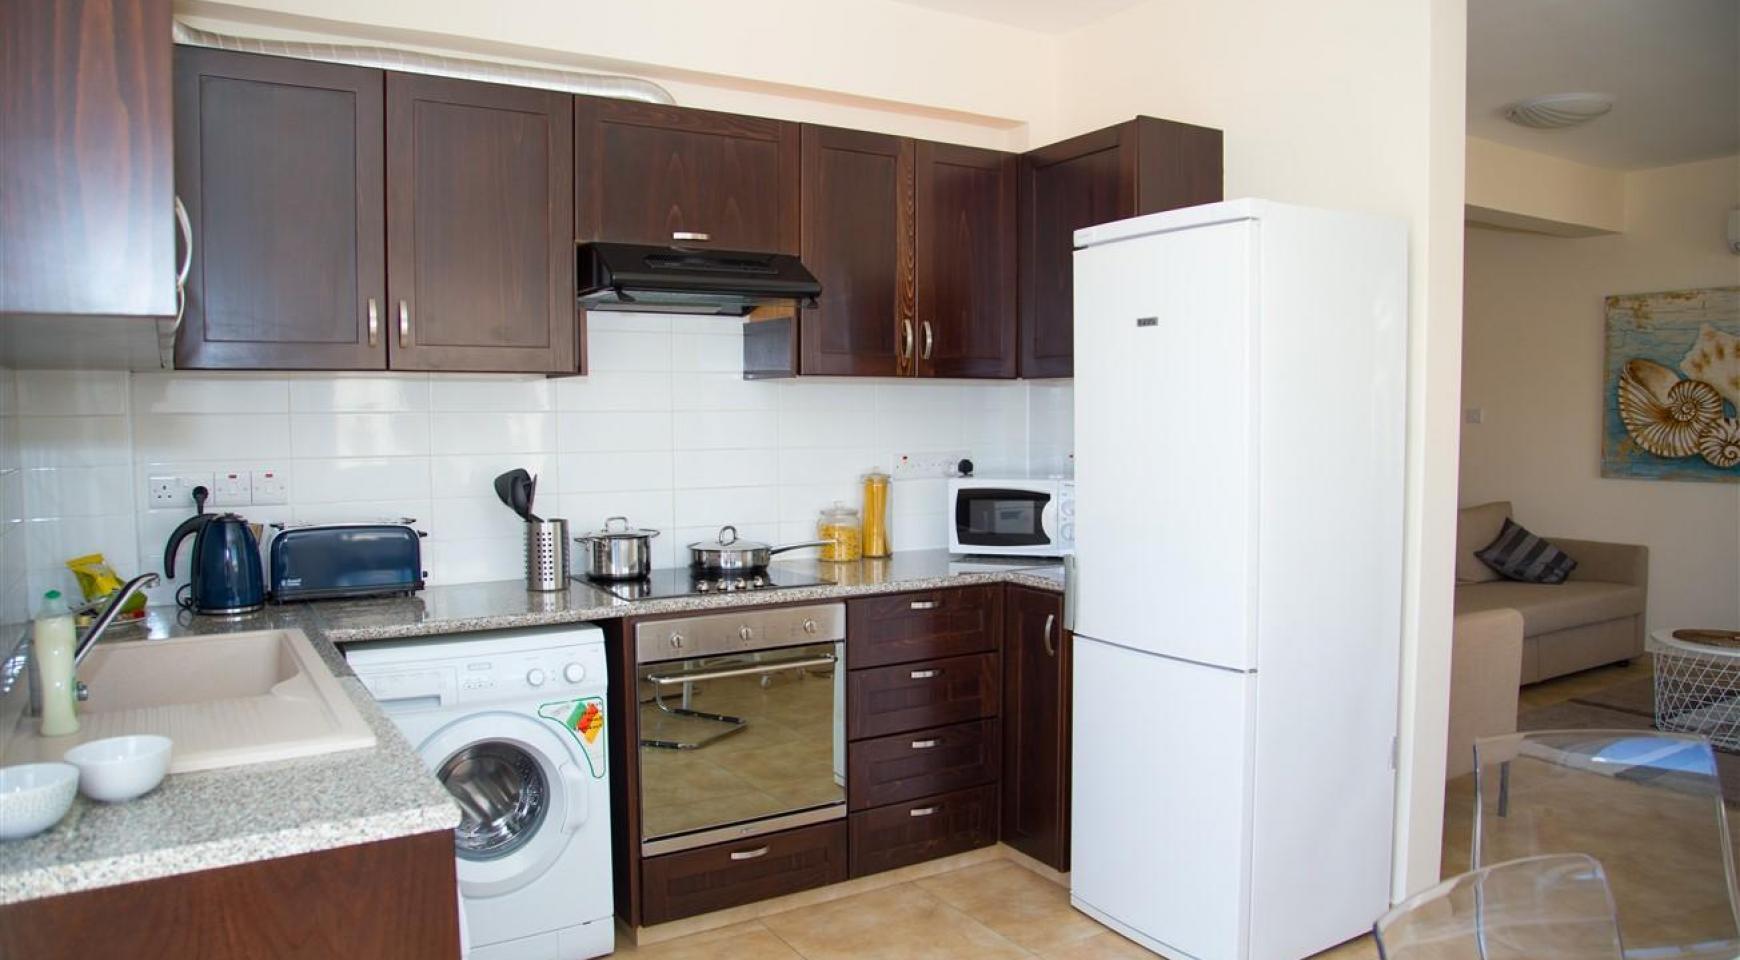 Luxury 2 Bedroom Apartment Frida 101 in the Tourist Area - 4